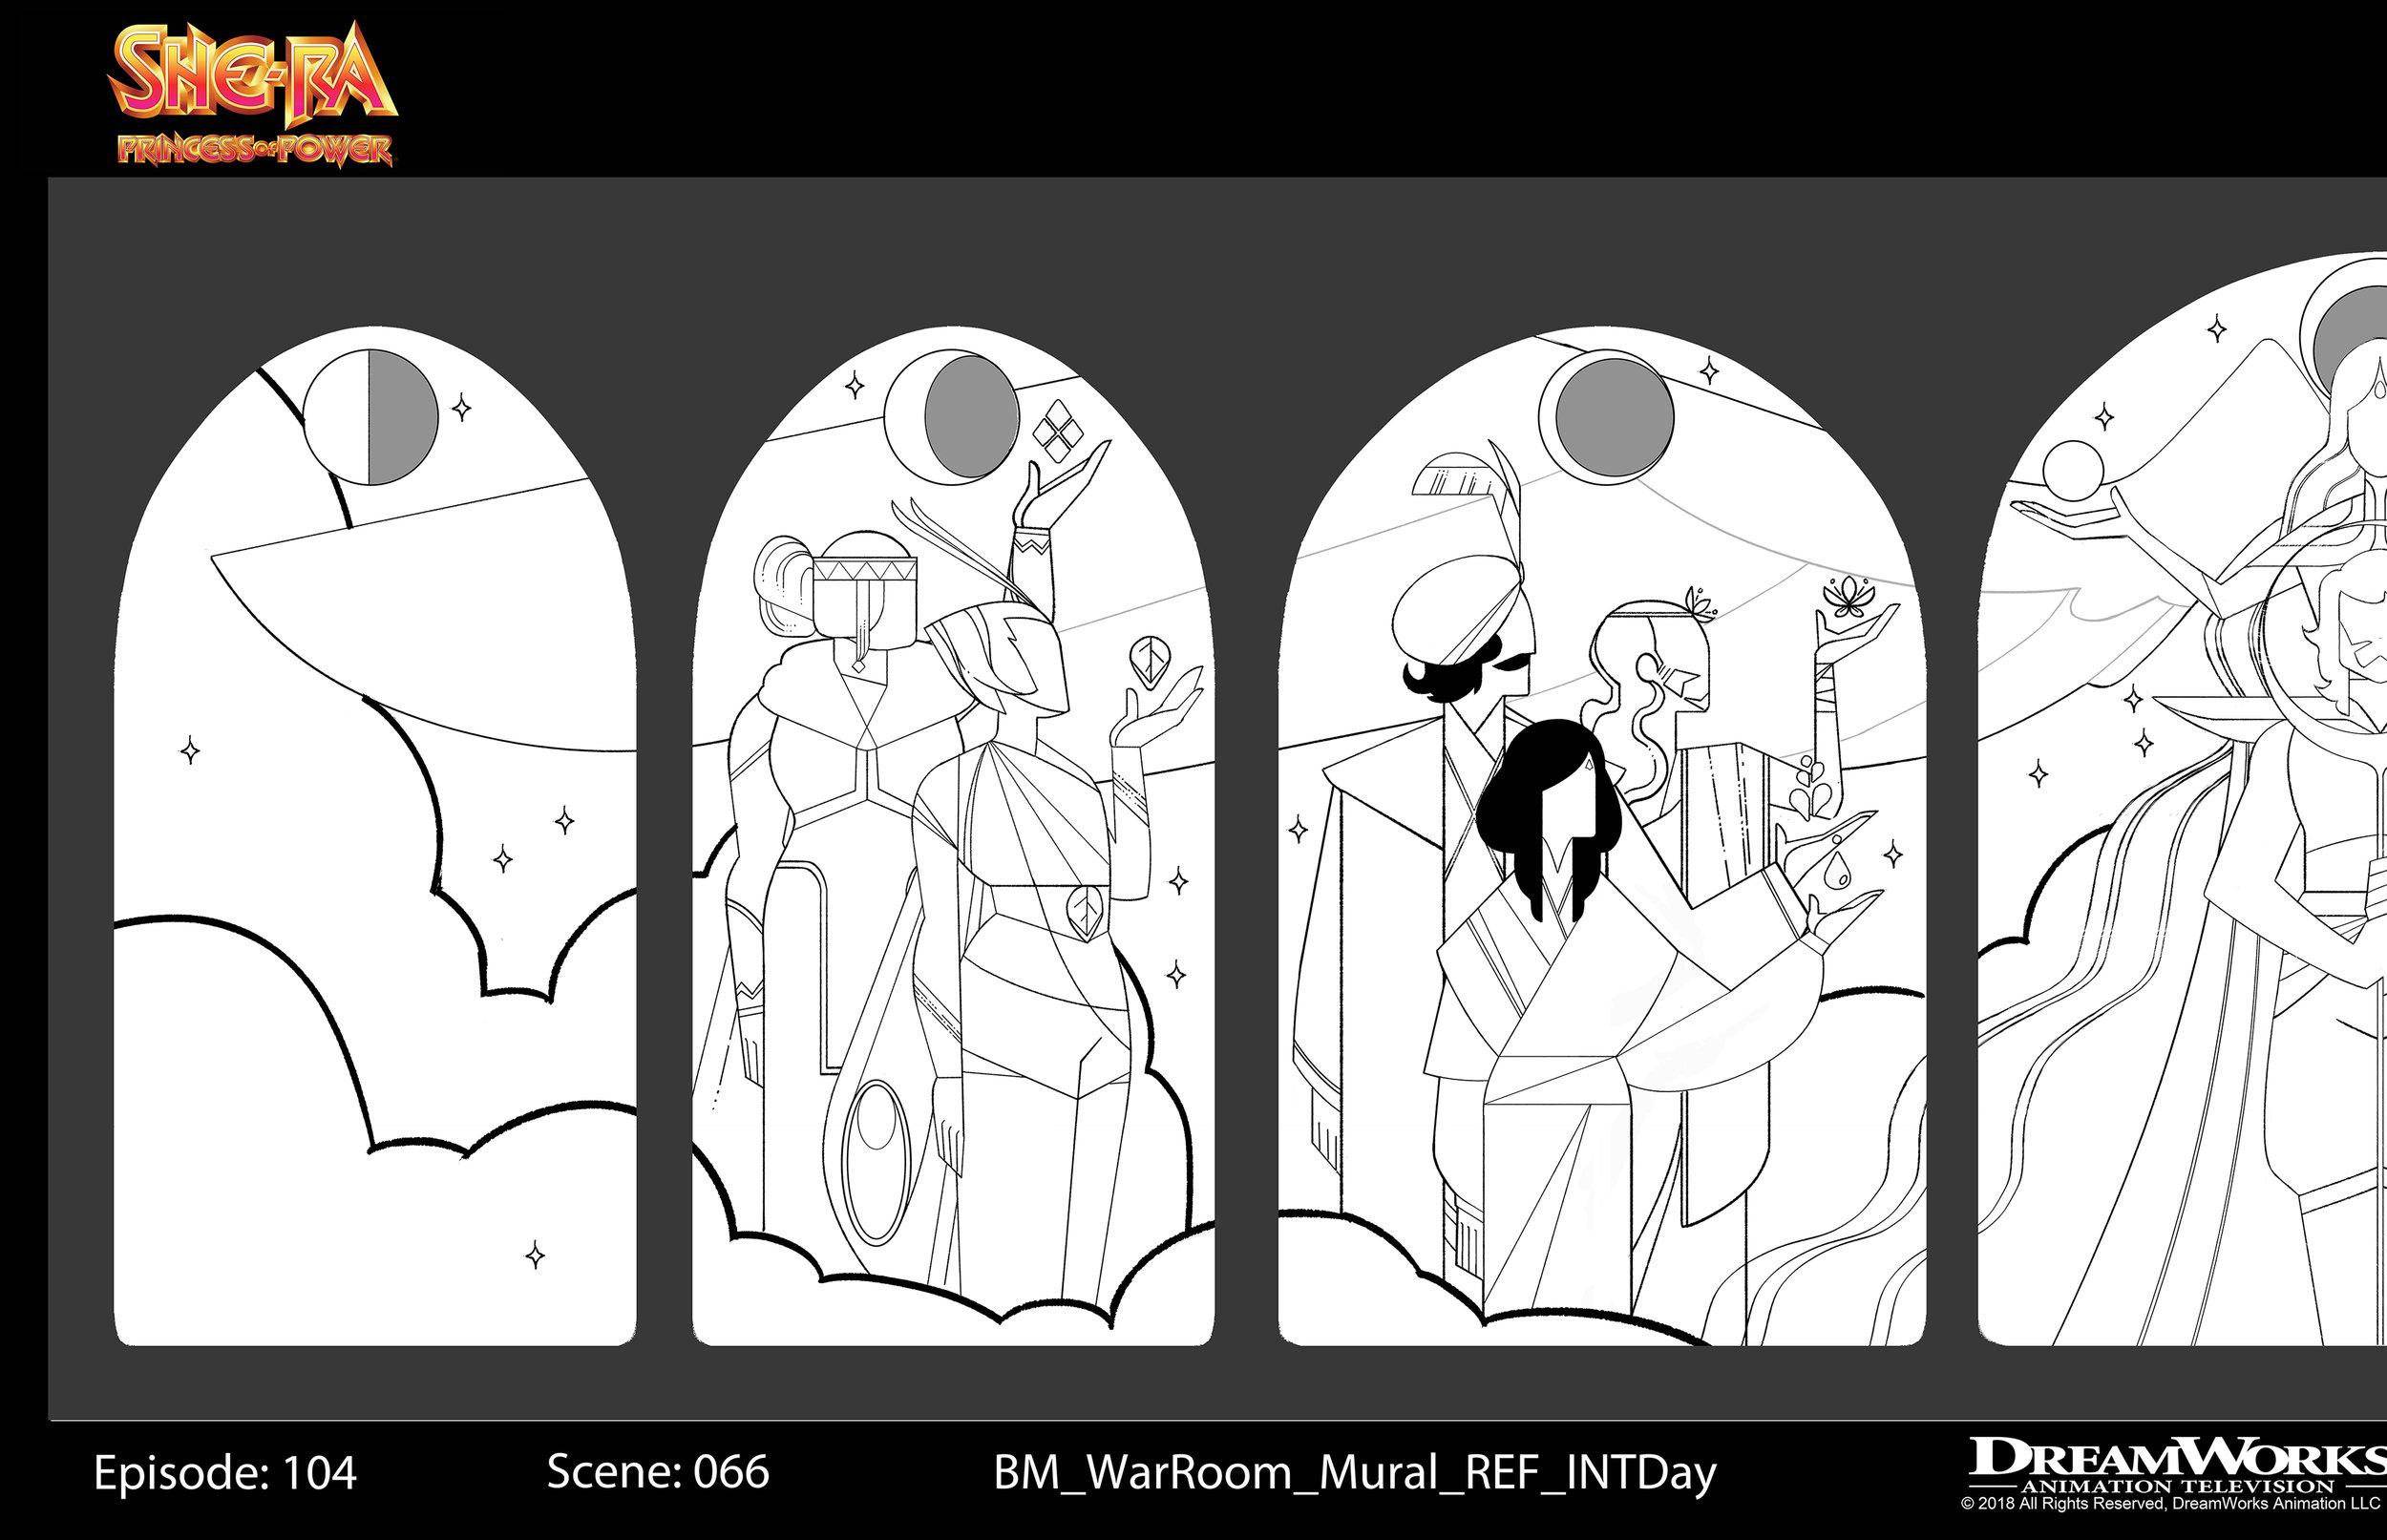 SHE104_BM_WarRoom_Mural_REF_INTDay_RUF_v001_XX copya.jpg